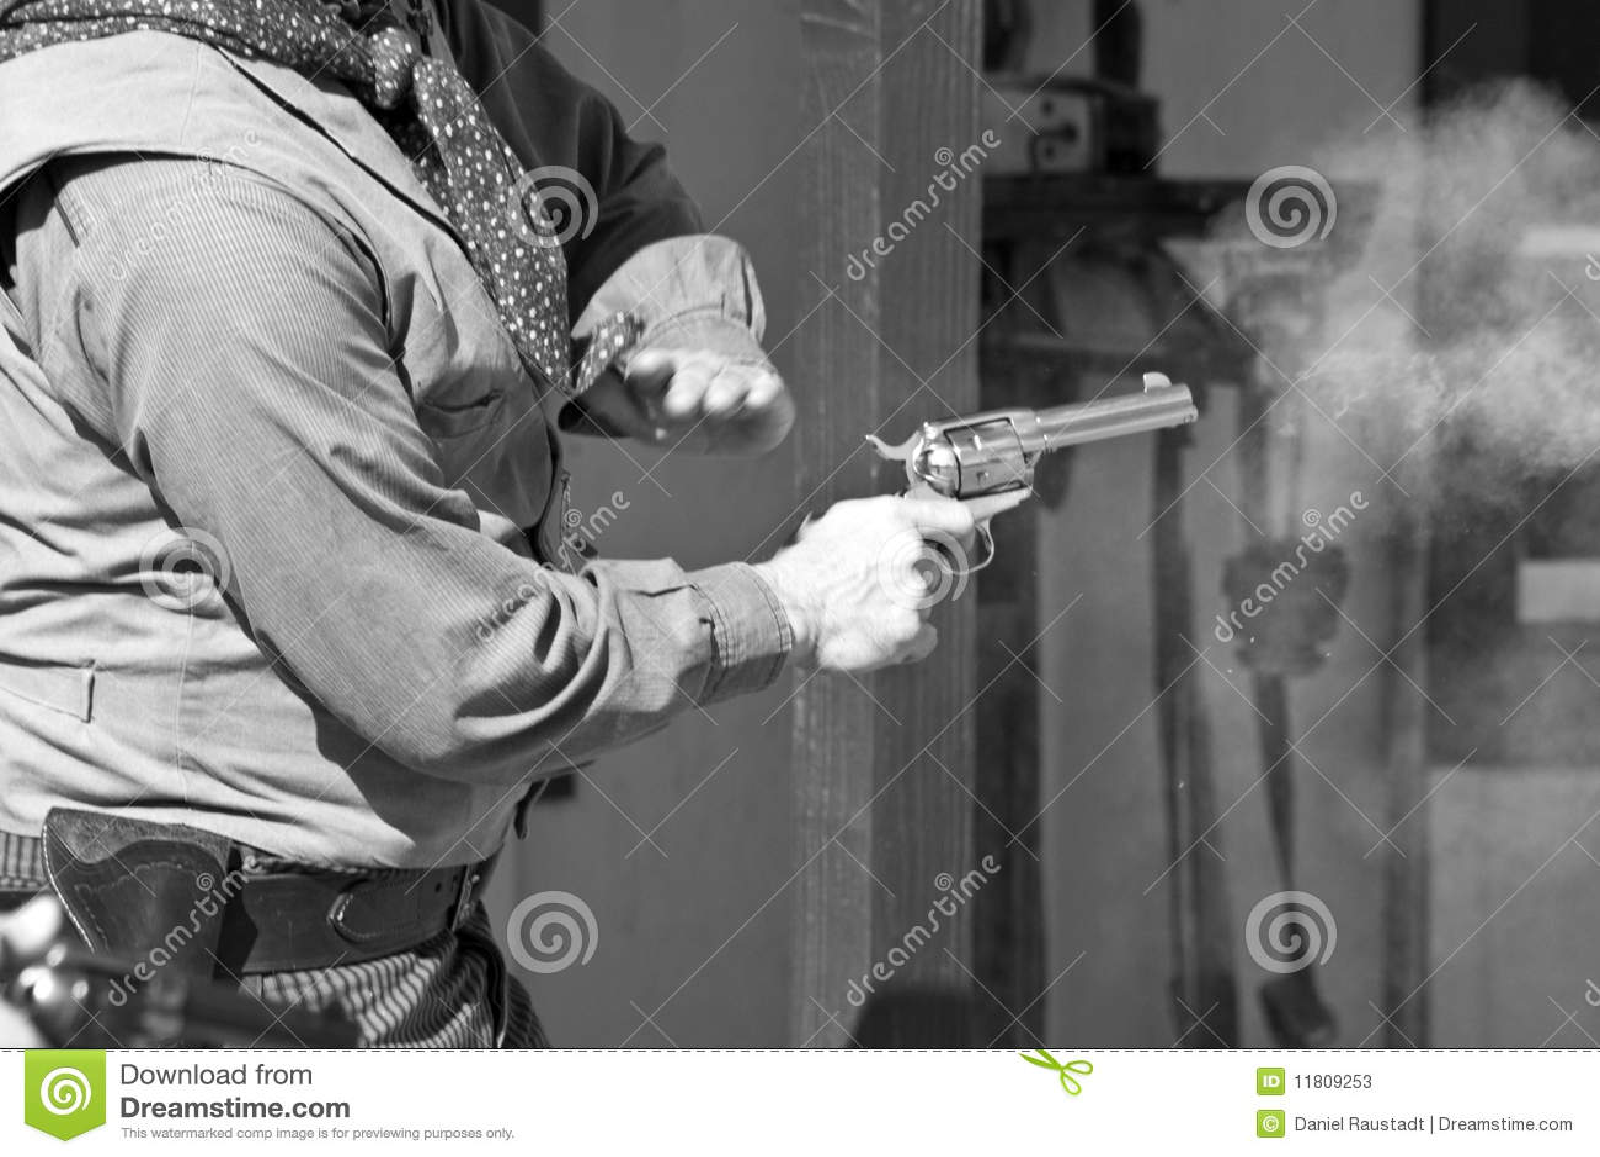 Old Western Gunfight